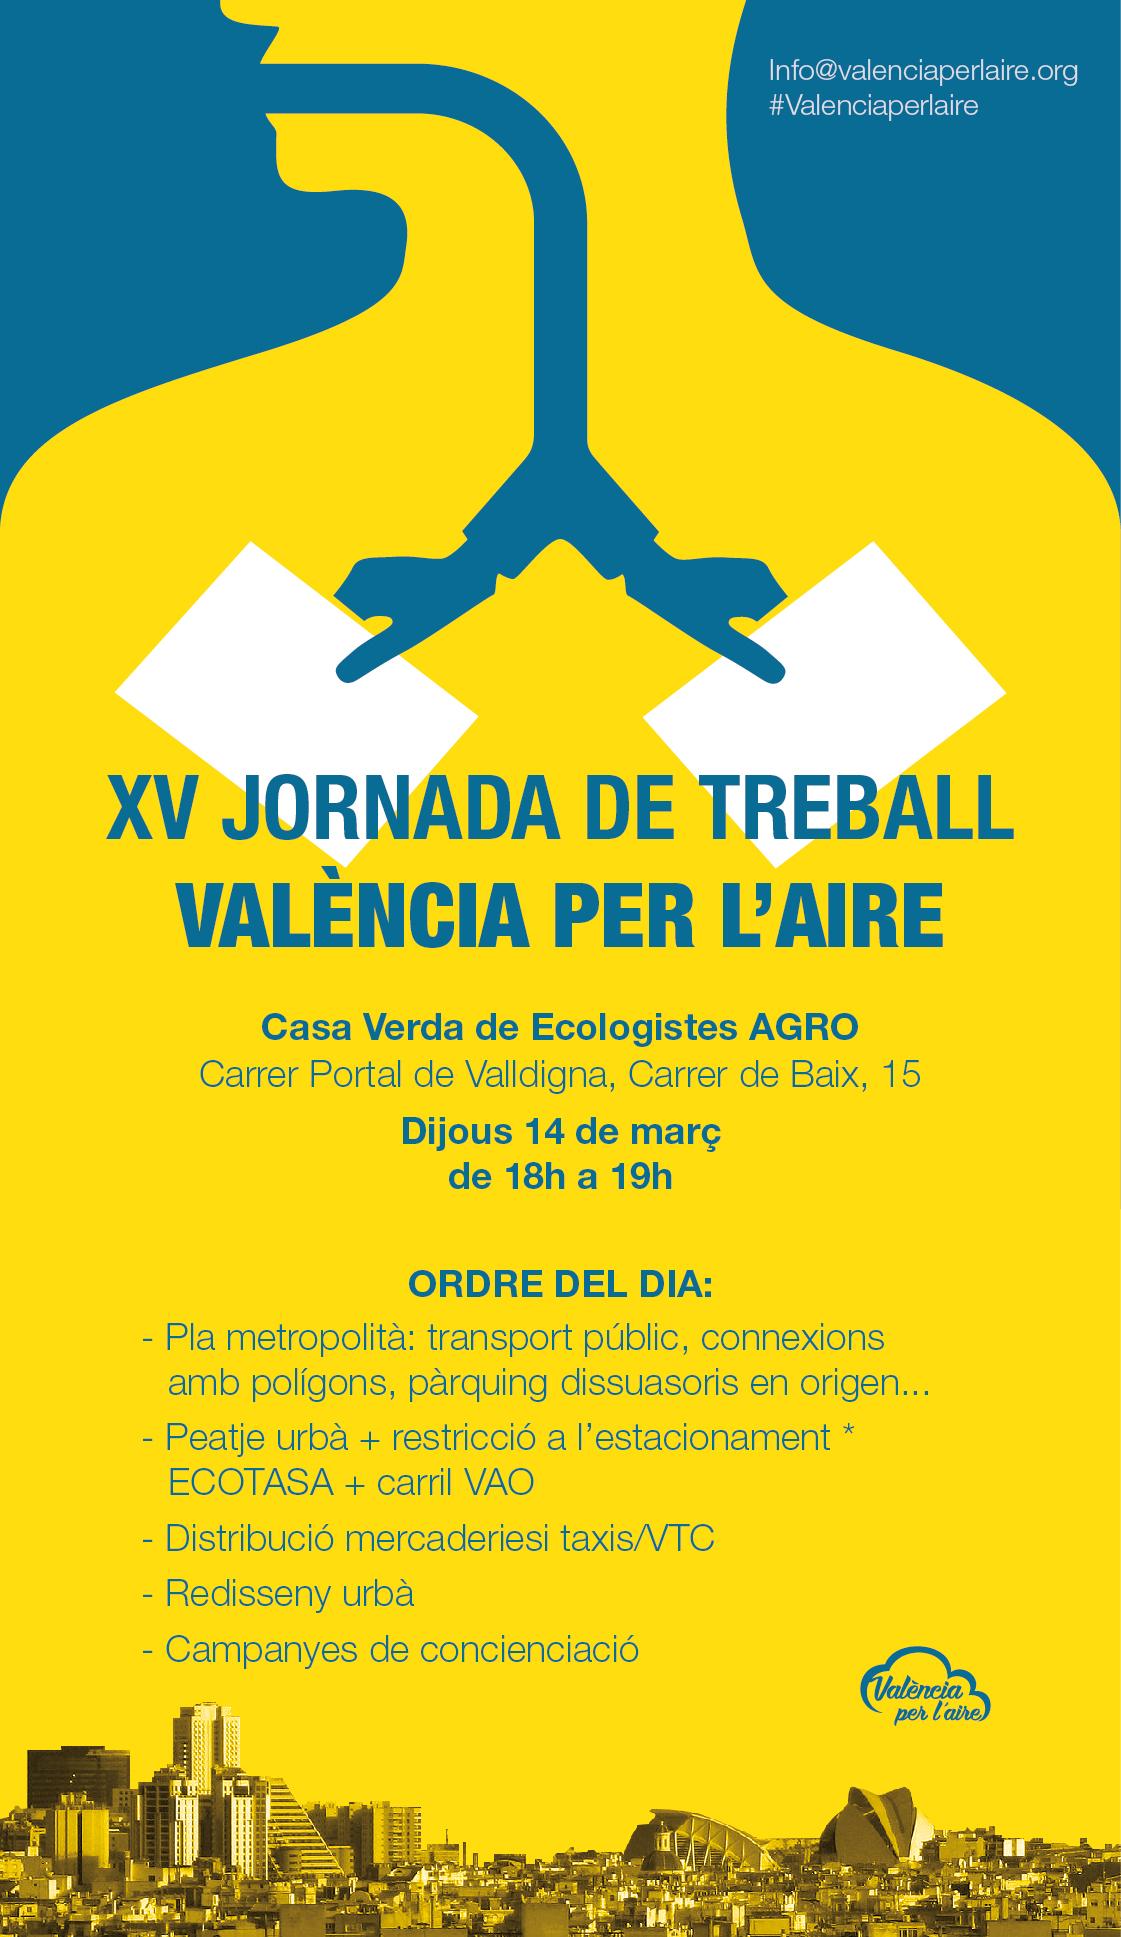 flyer Valencia per laire - 15 JORNADA - Casa Verda-01